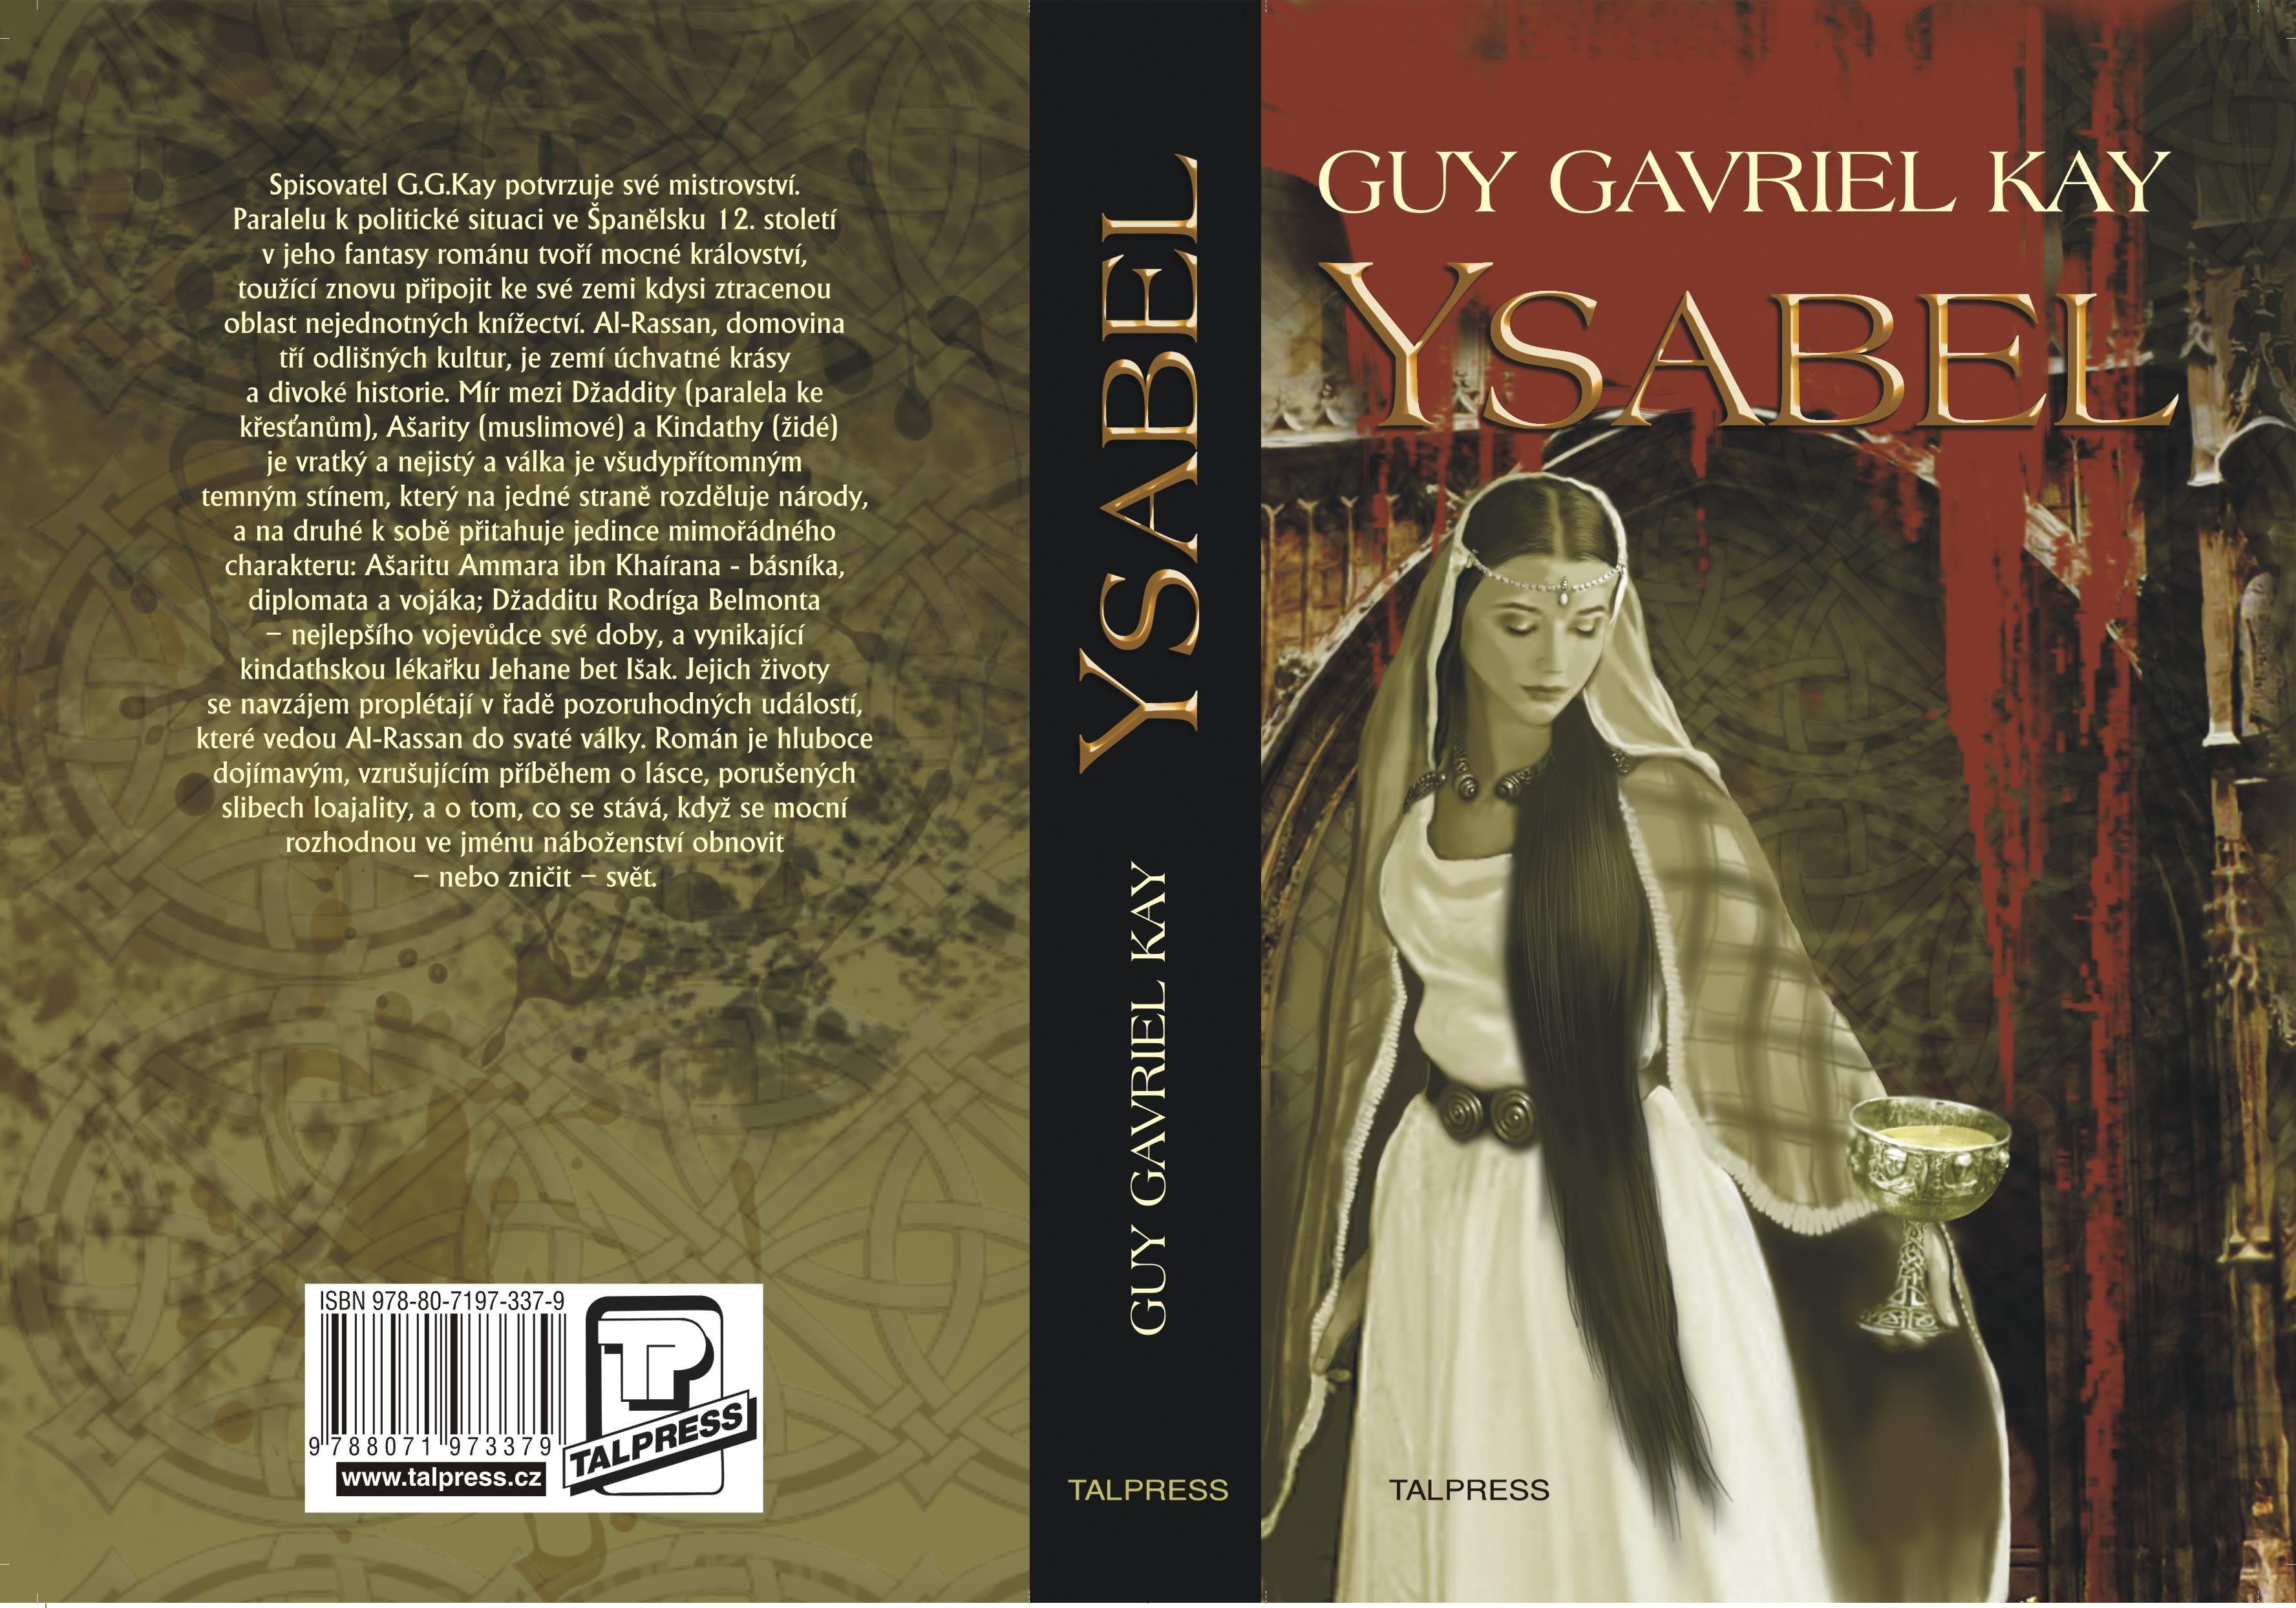 Czech Republic edition of Ysabel